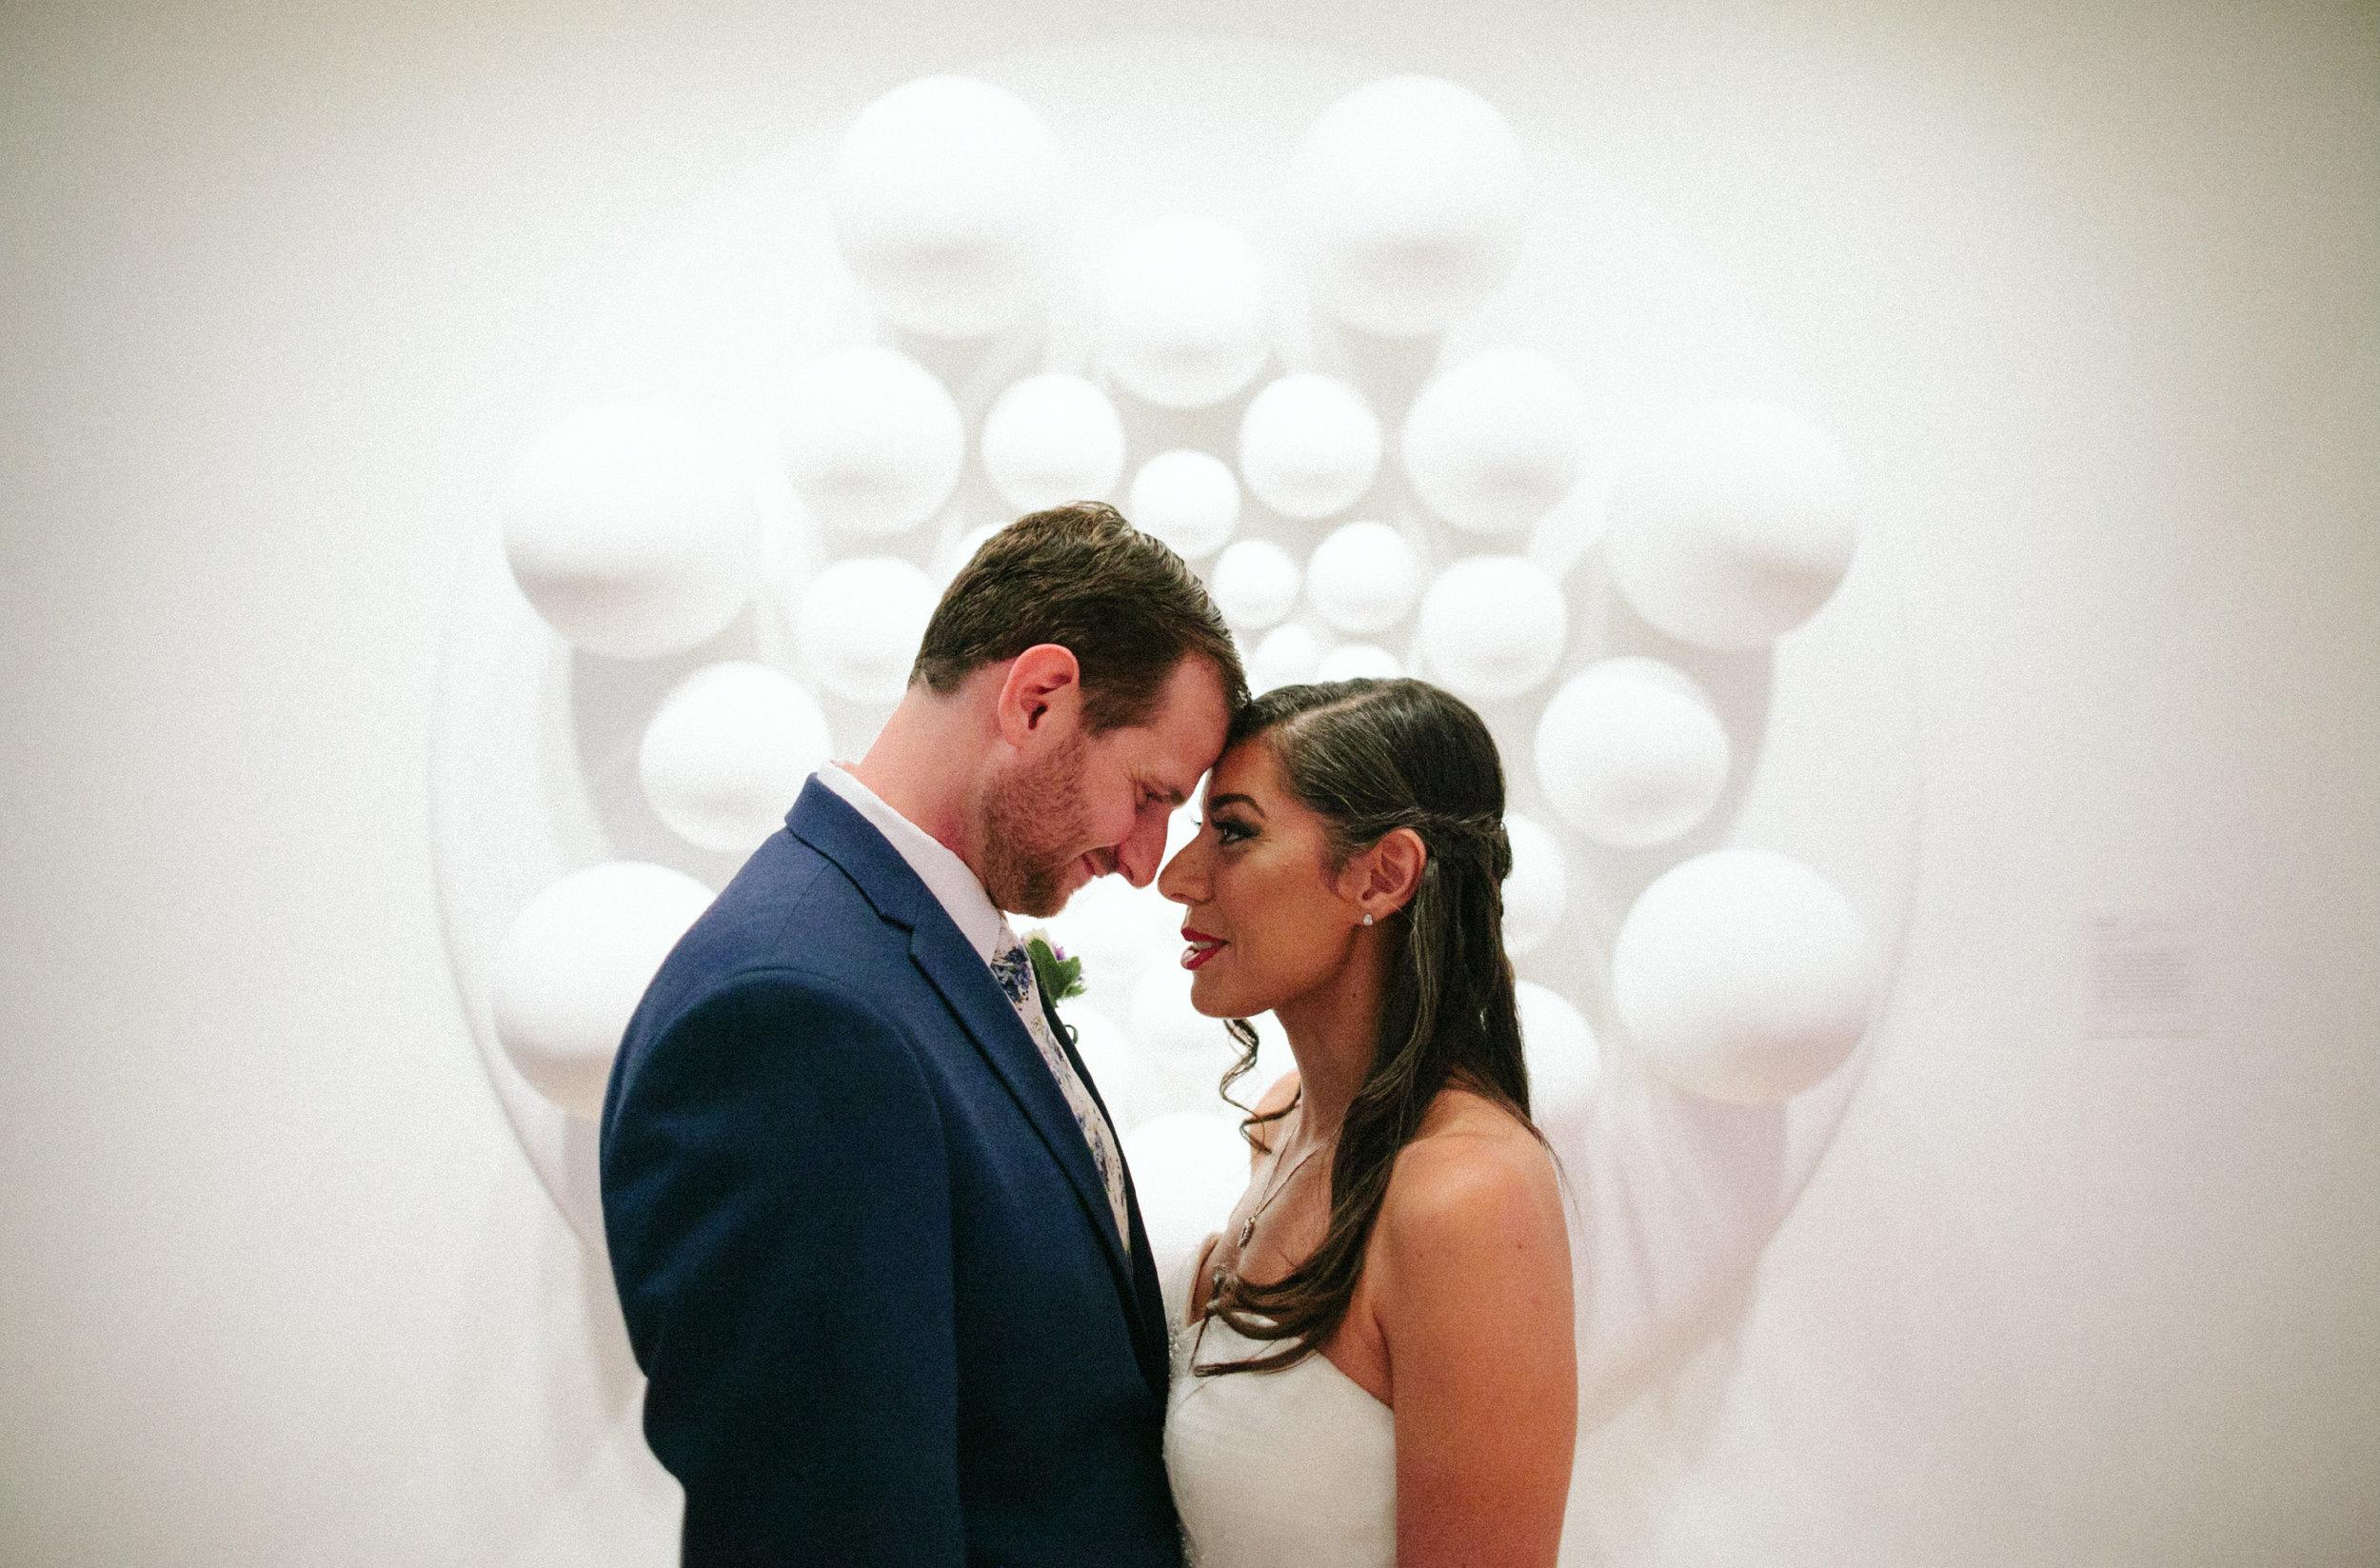 Museum Wedding at the Boca Raton Museum3.jpg